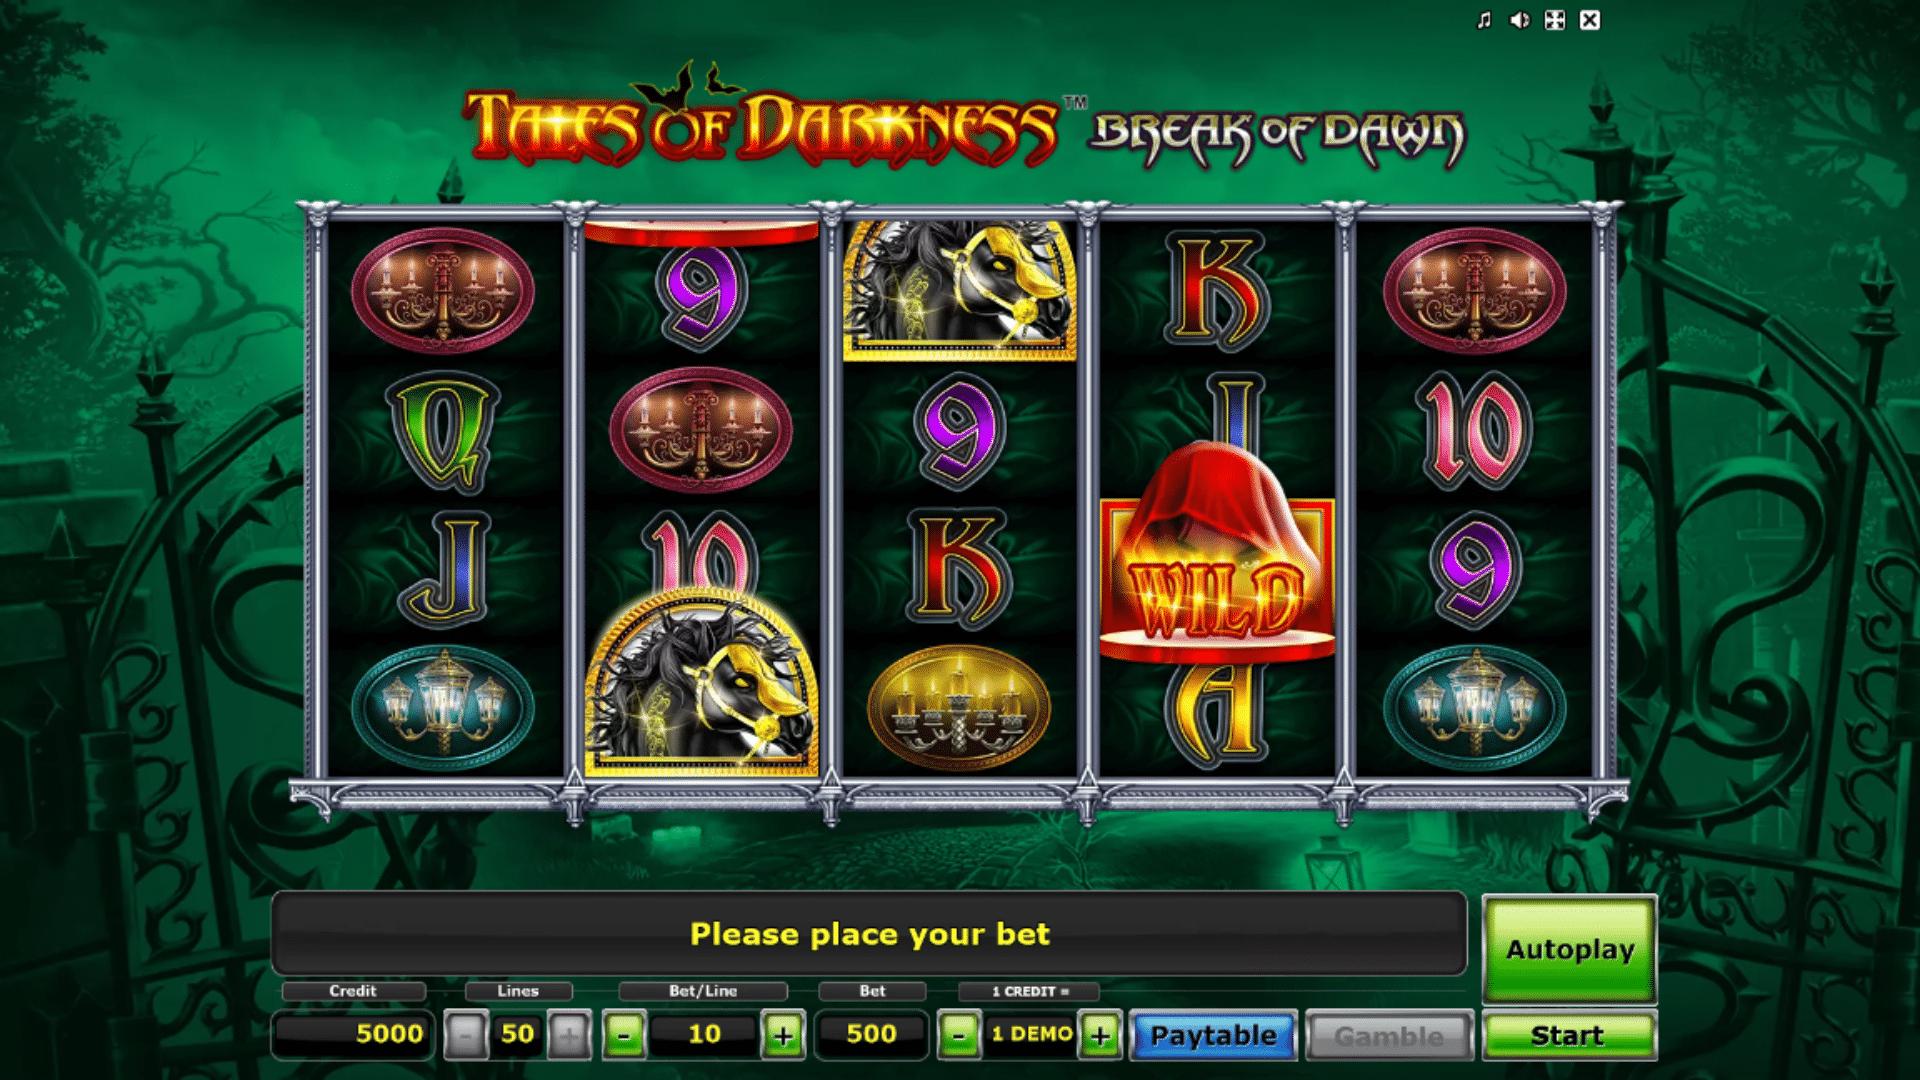 Slot Tales of Darkness Break of Dawn